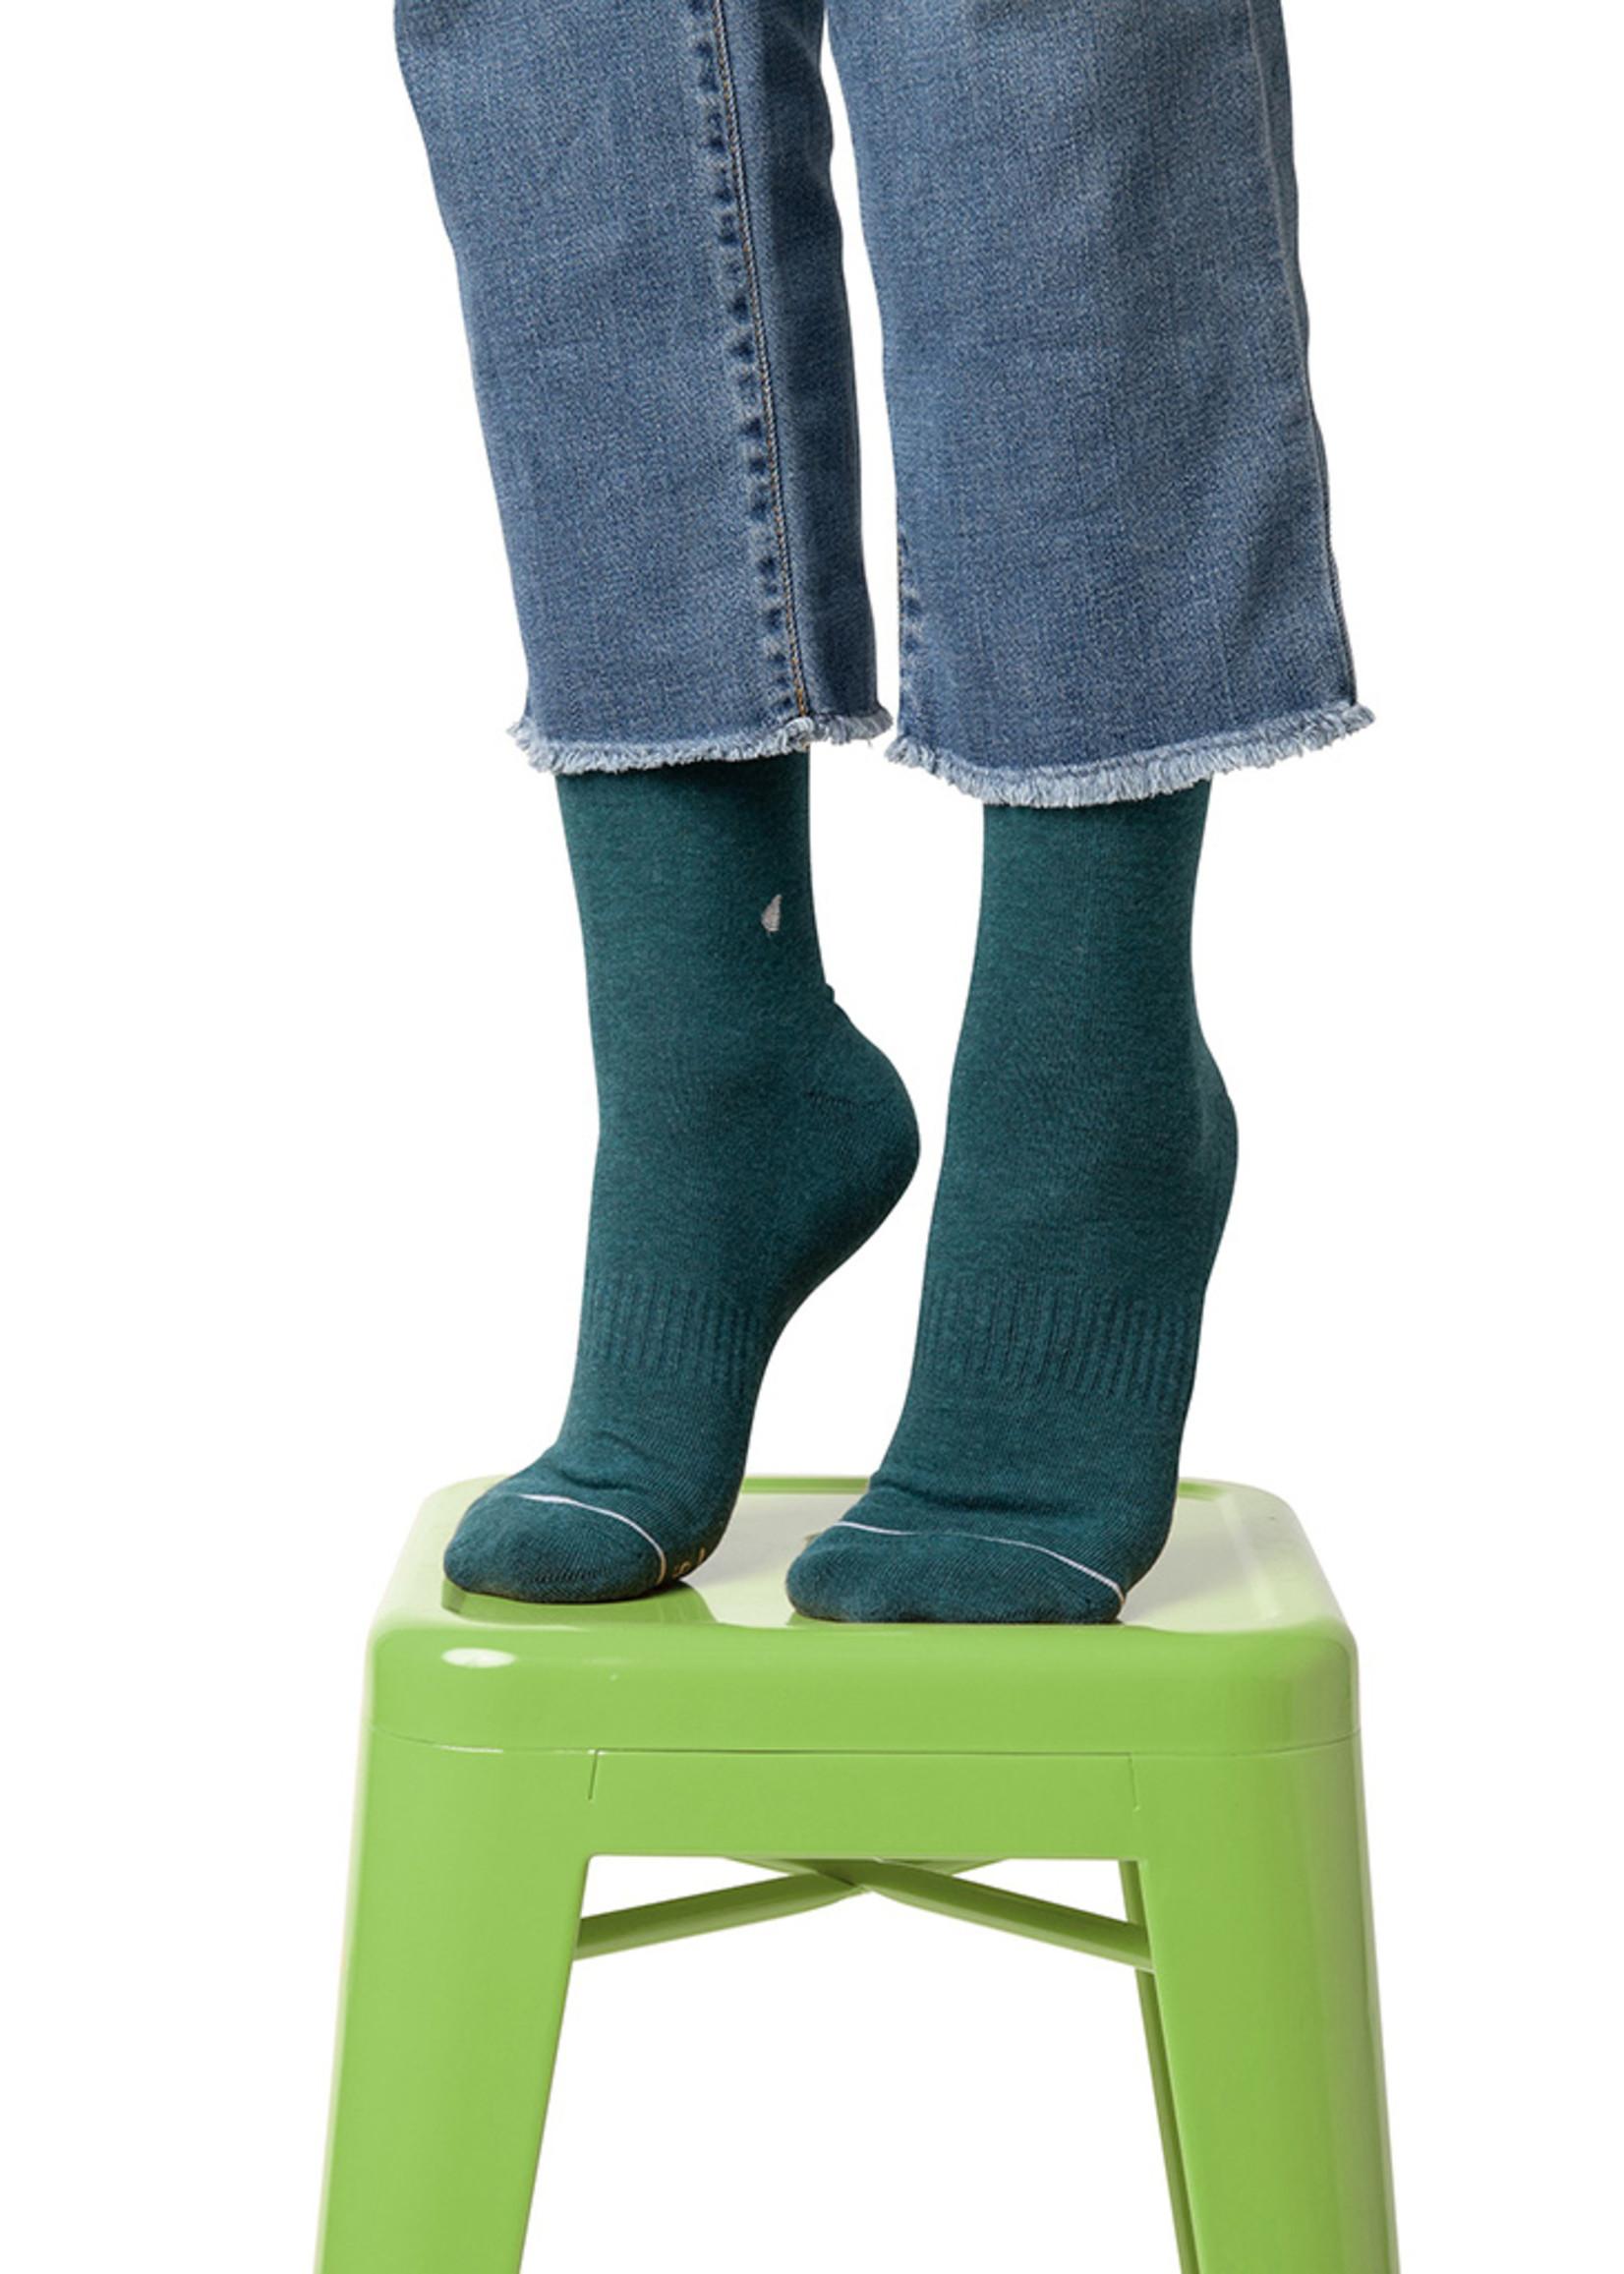 Box of Socks That Protect Rainforests (men's)